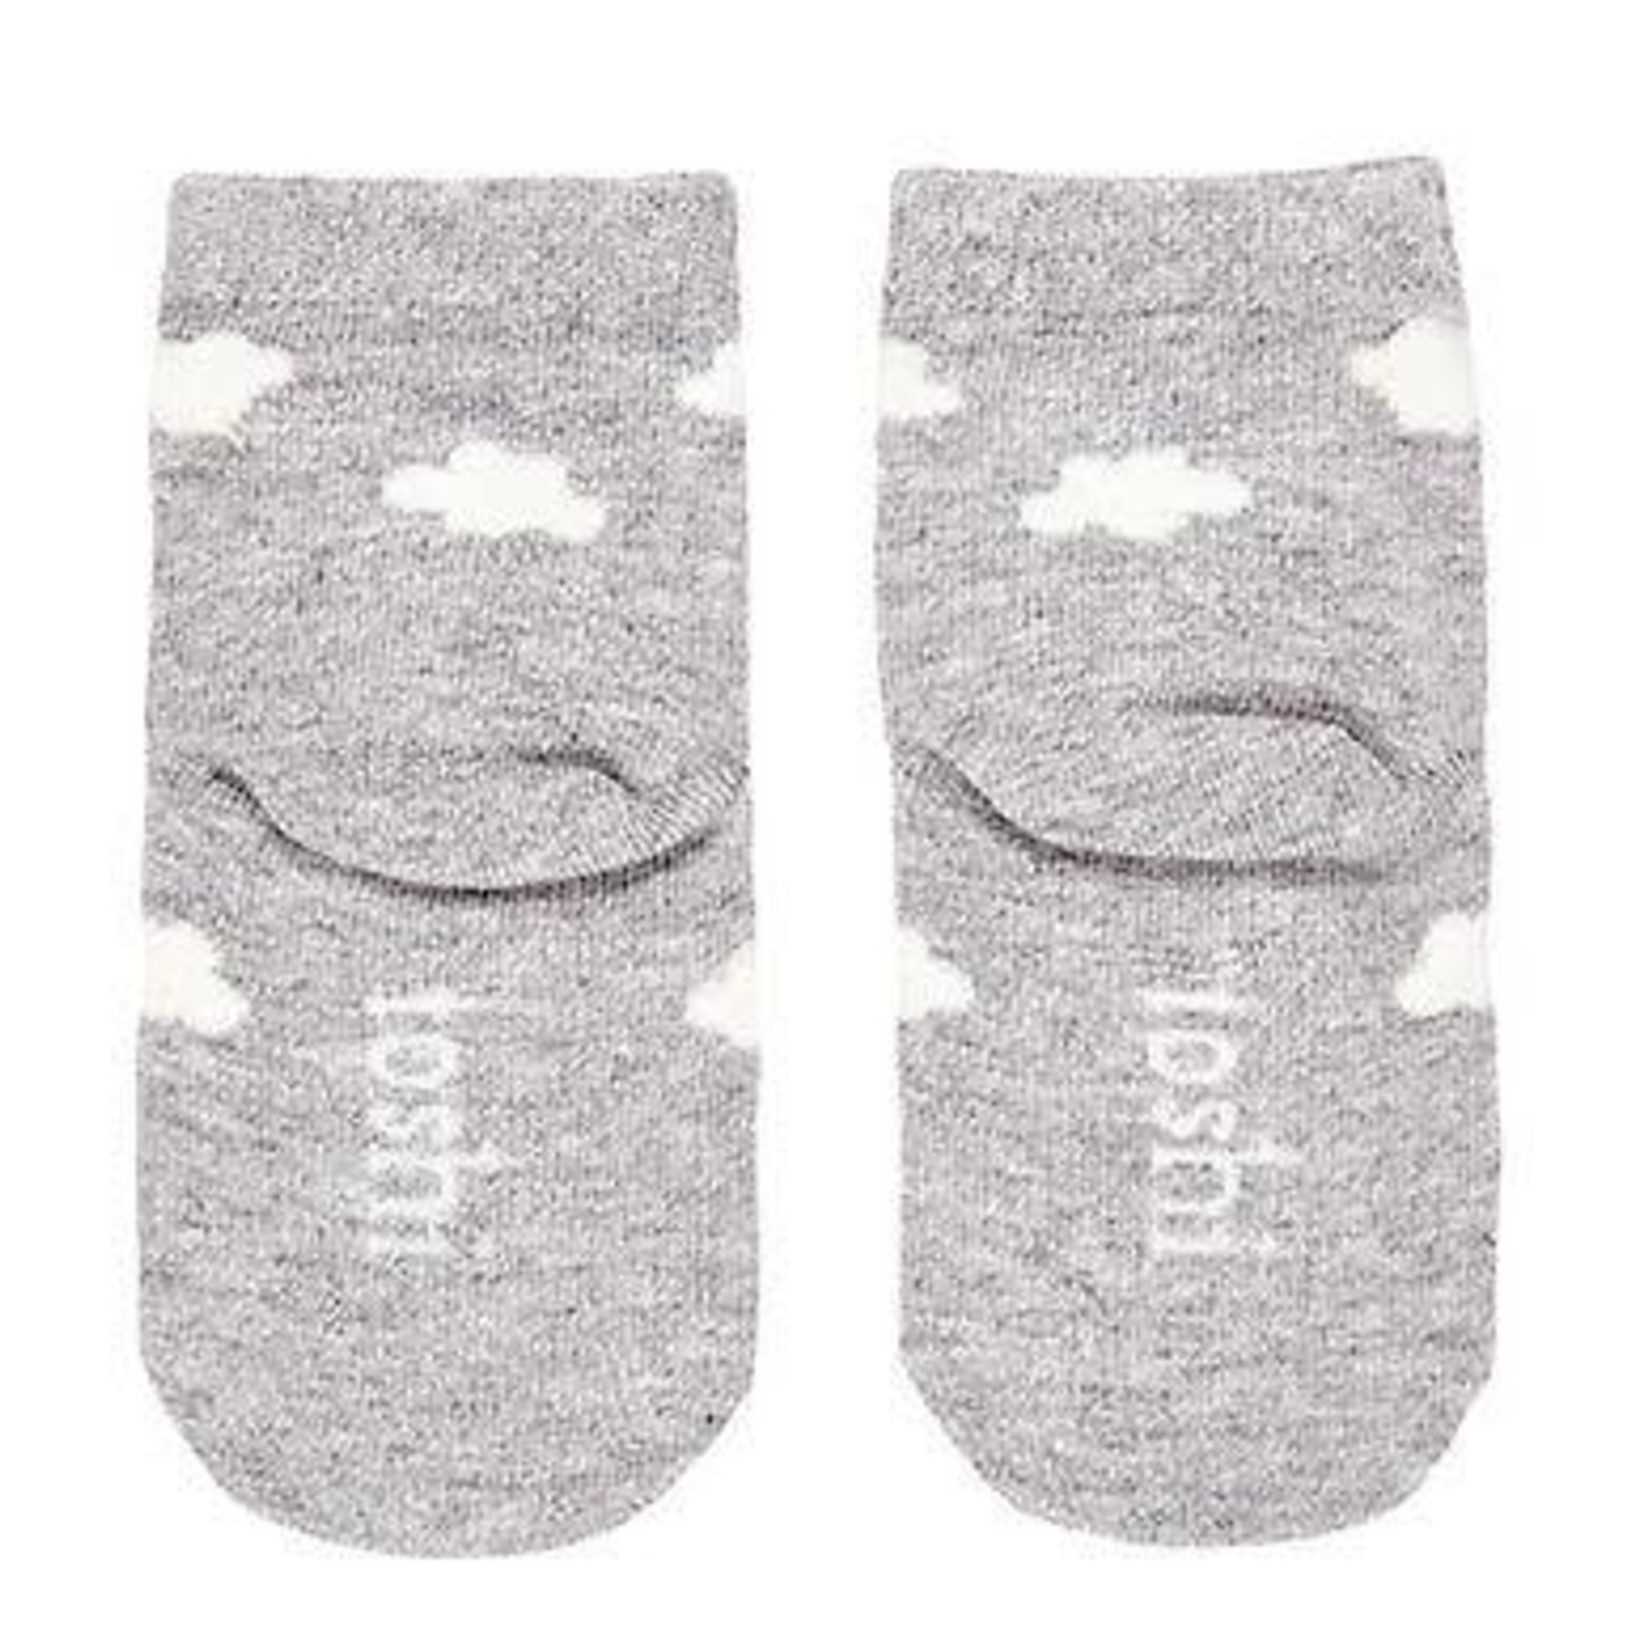 Toshi Toshi Organic Socks - Boys Clouds